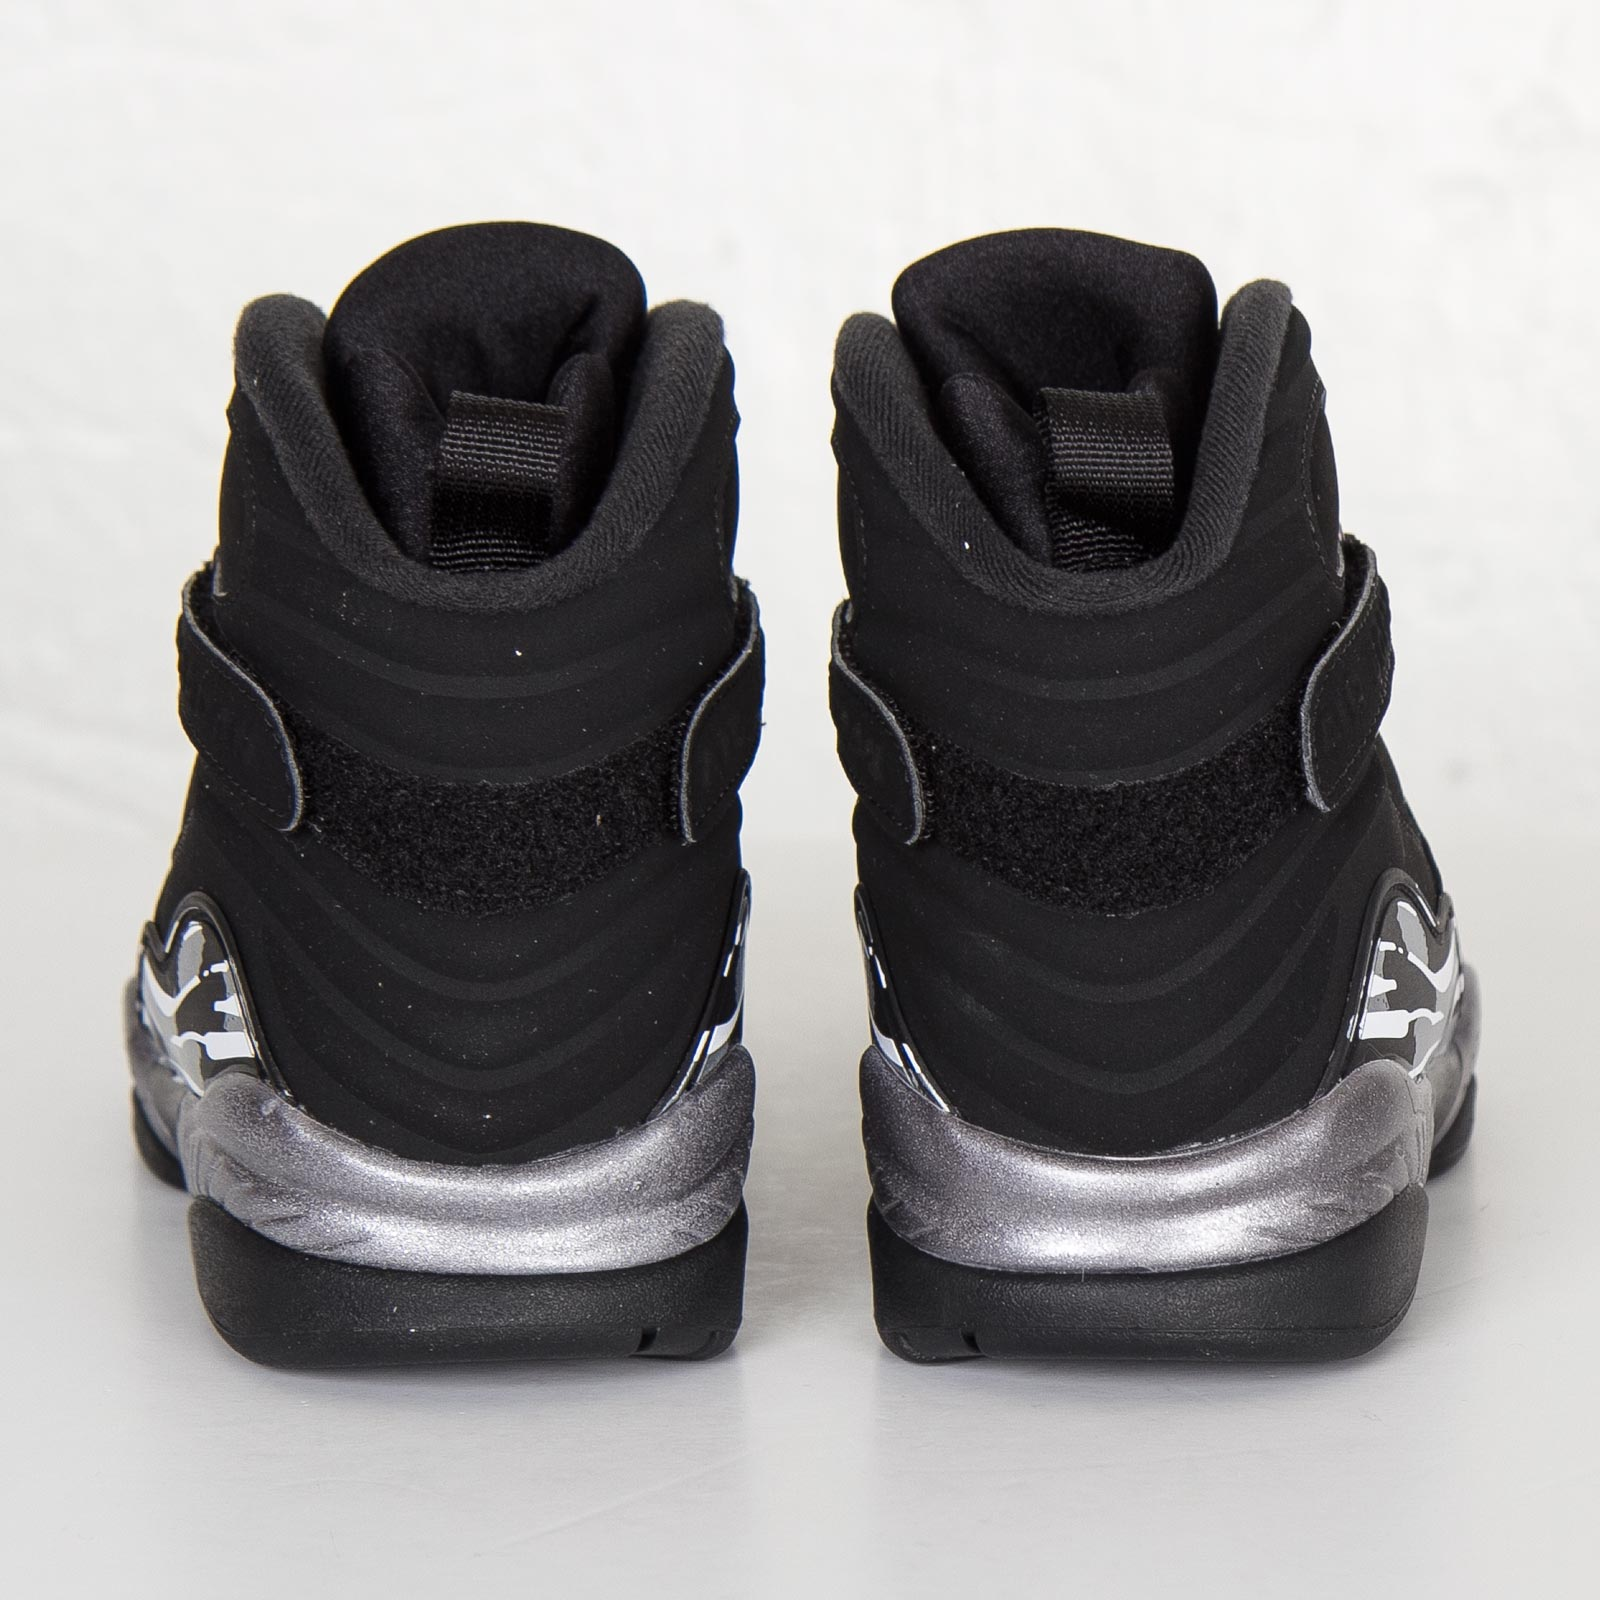 best sneakers 98aea e9dd5 Jordan Brand Air Jordan 8 Retro - 305381-003 - Sneakersnstuff   sneakers    streetwear online since 1999